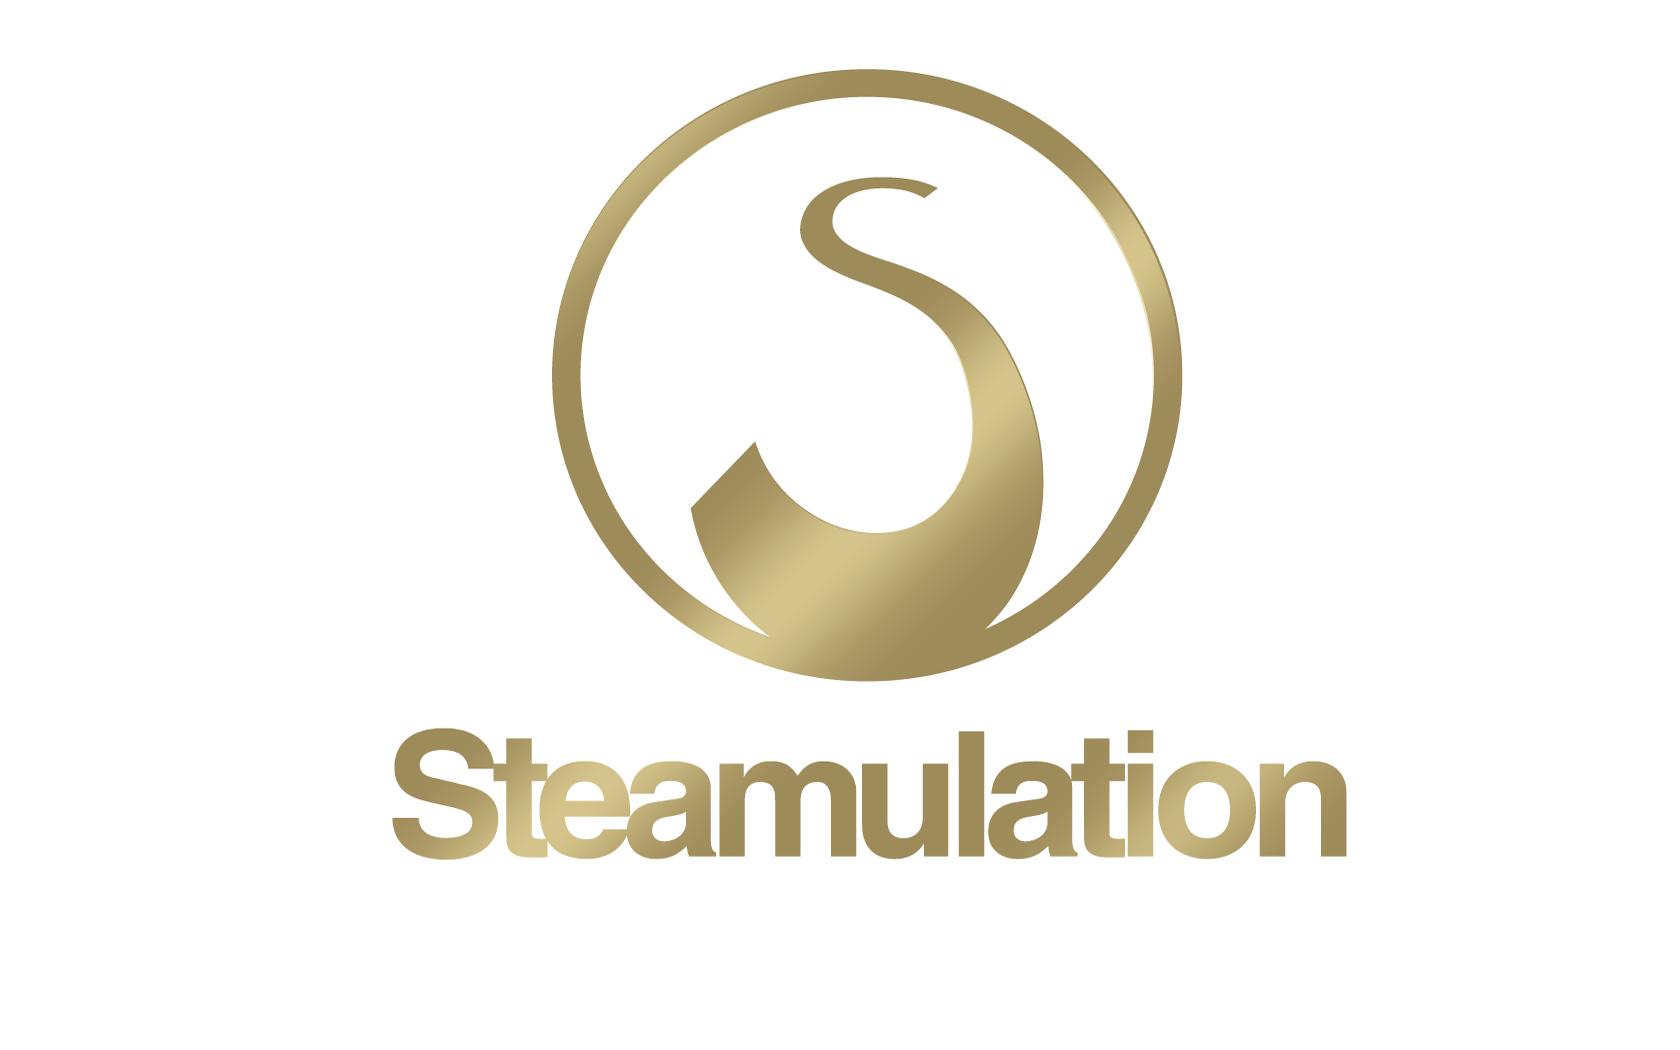 Steamulation Luxus Shisha